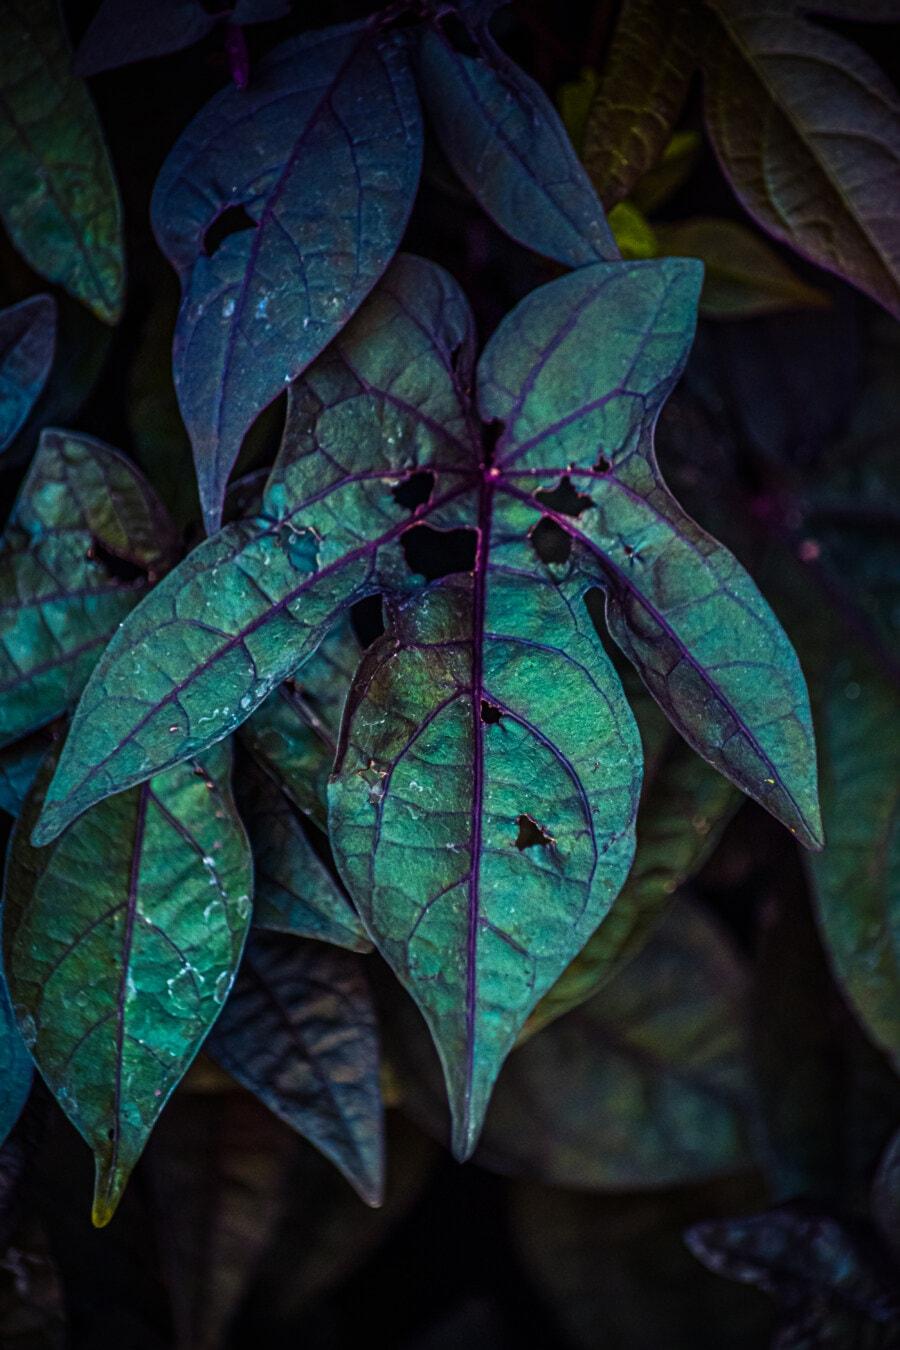 leaf, dark green, hole, green leaf, texture, shade, nature, shrub, flora, garden